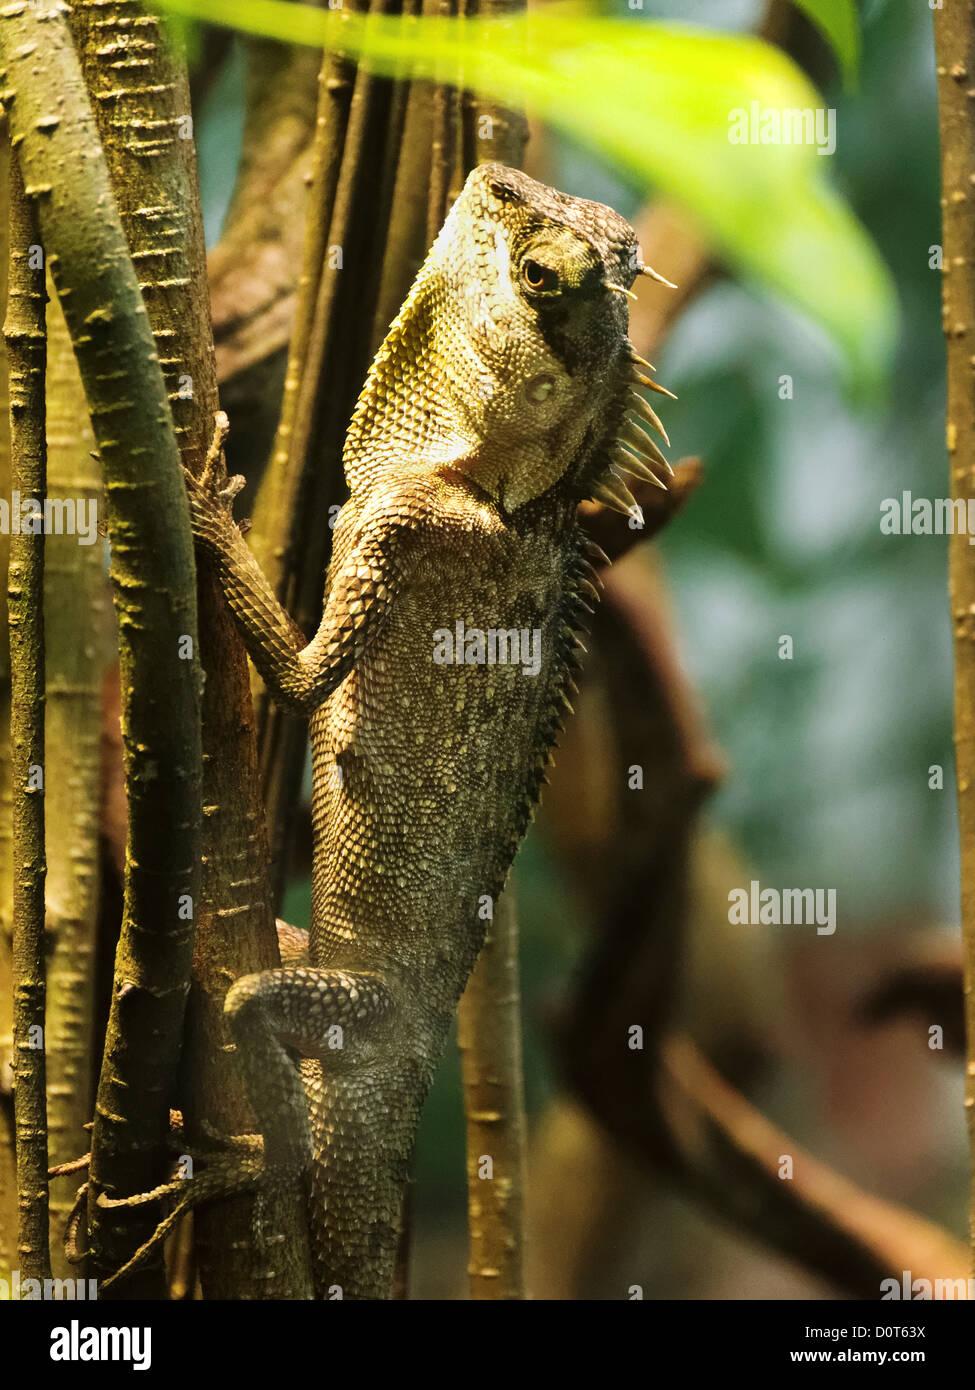 Acanthosaura capra, Dählhölzli, saurian, green procklenape, canton Bern, critters, crawlers, reptiles, - Stock Image